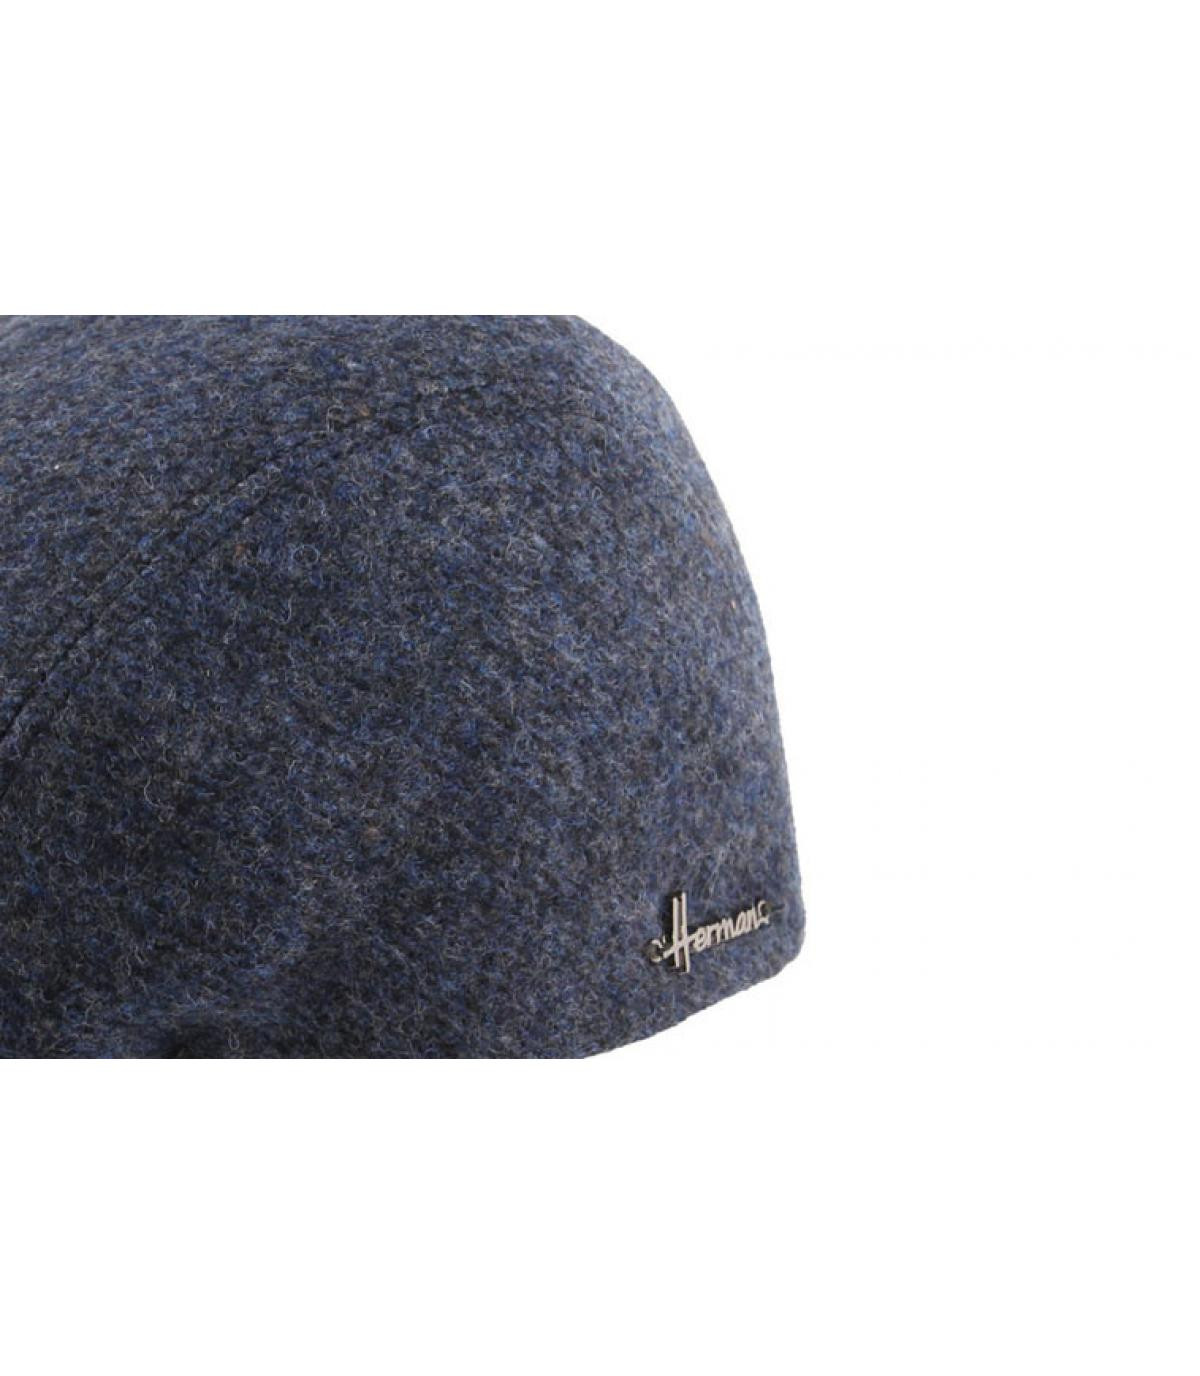 Dettagli Range wool EF blue - image 3